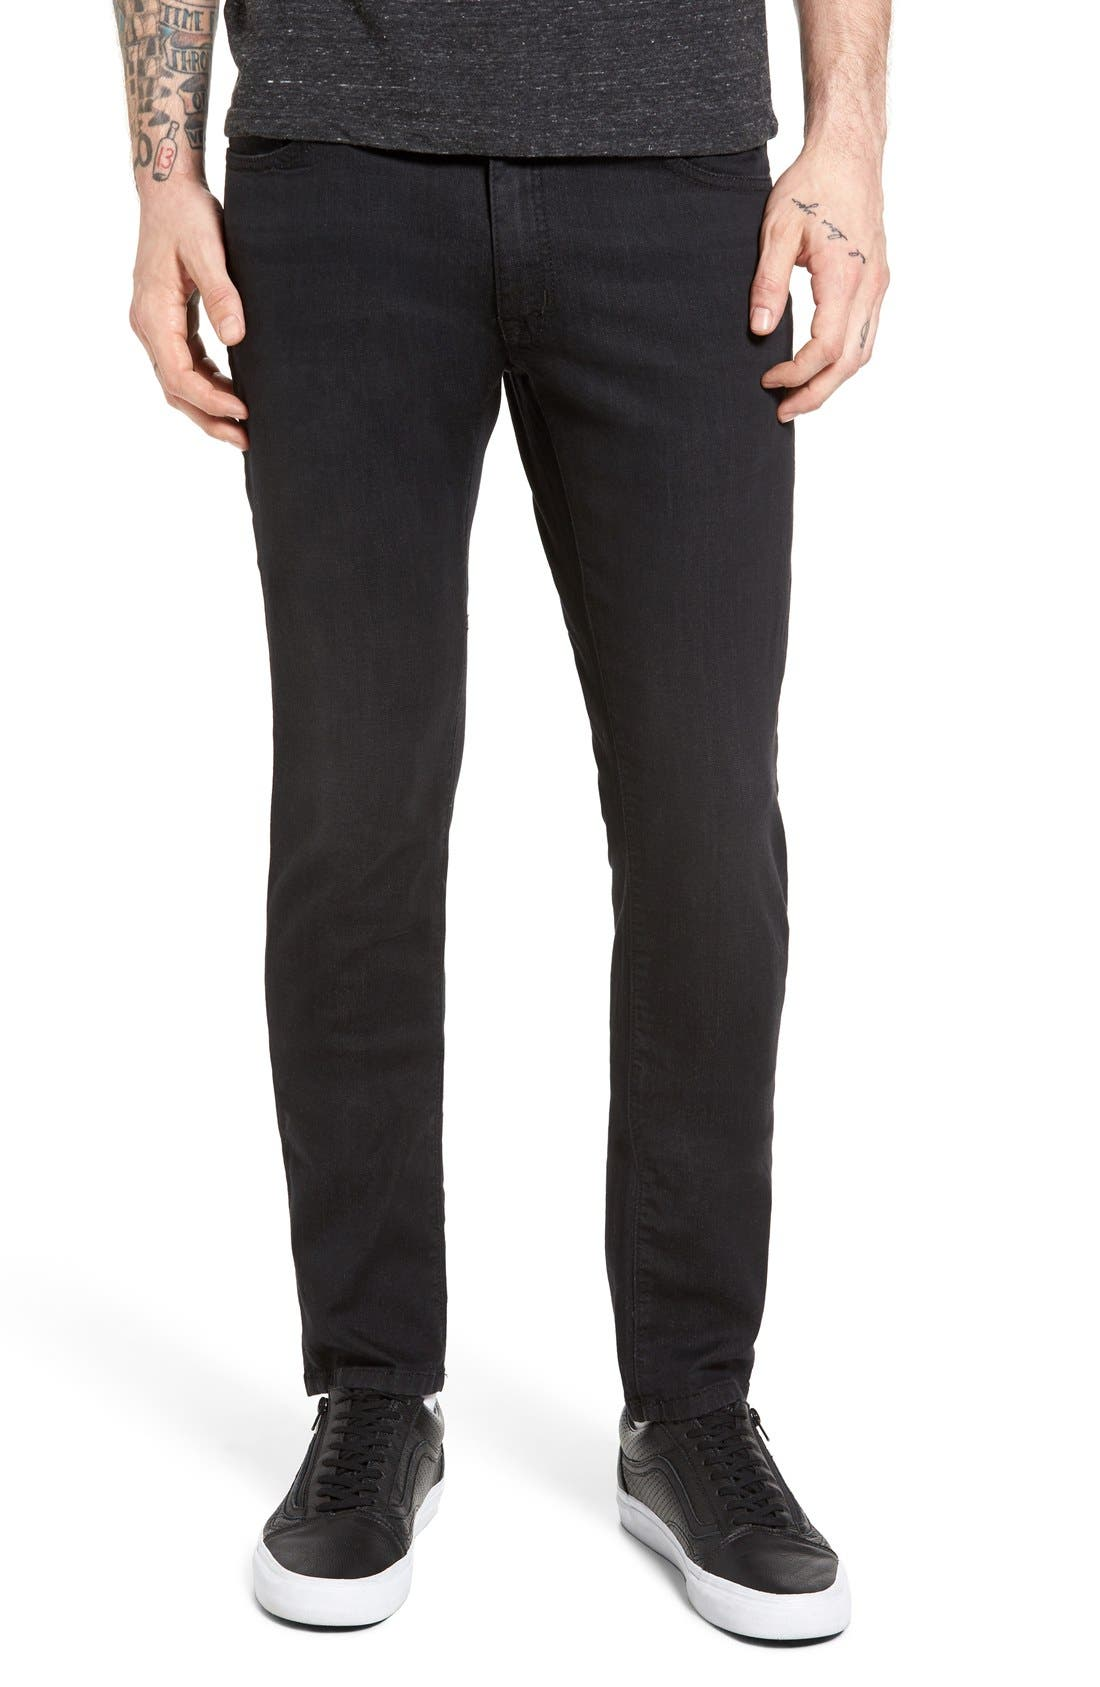 Main Image - Fidelity Denim Torino Slim Fit Jeans (Raven Black)